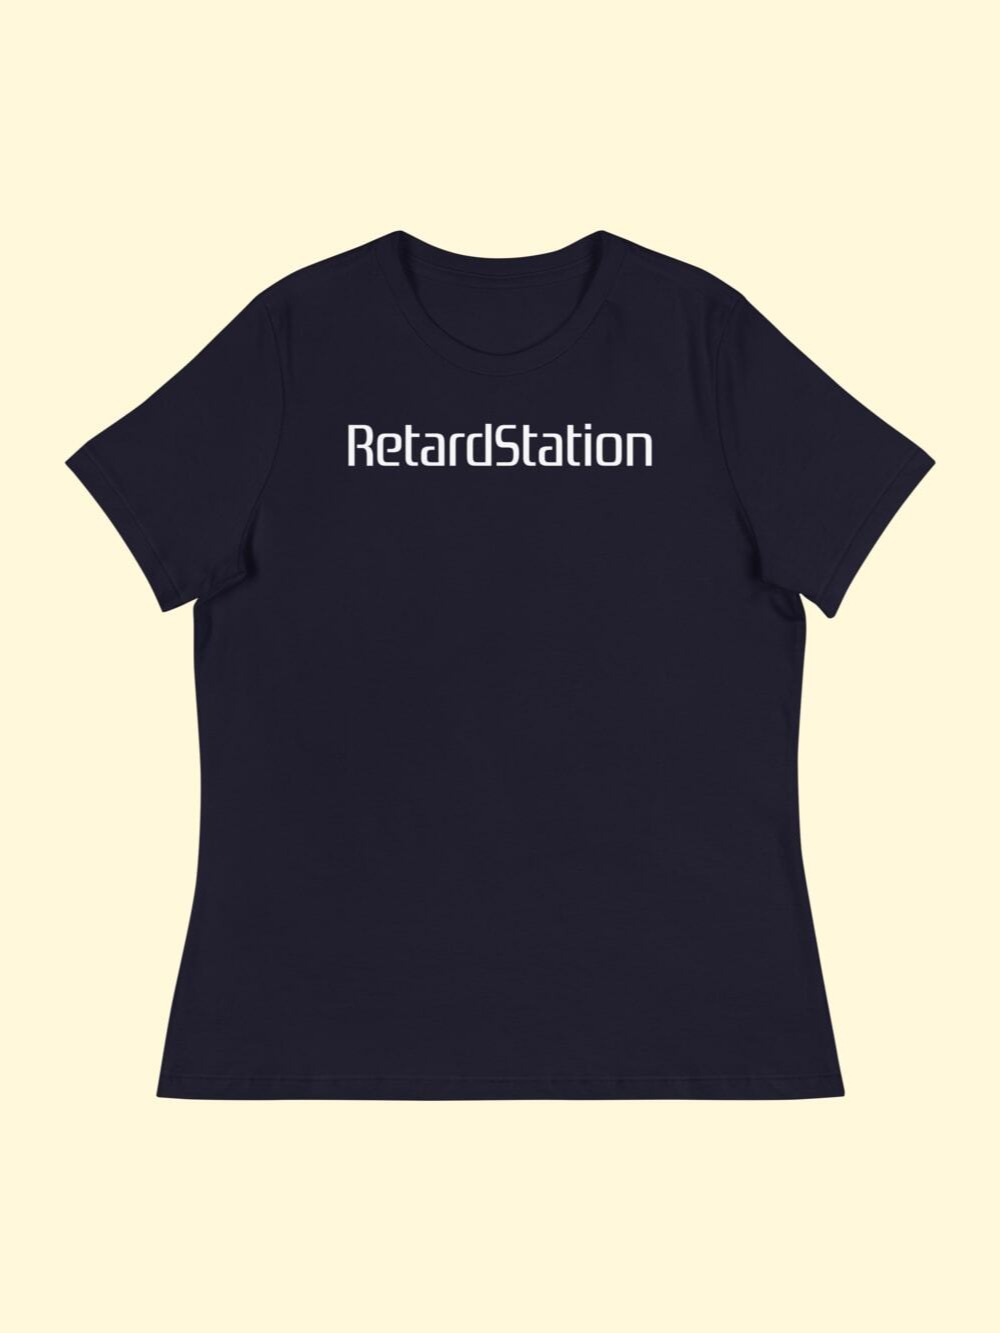 RetardStation Women's T-shirt product image (1)